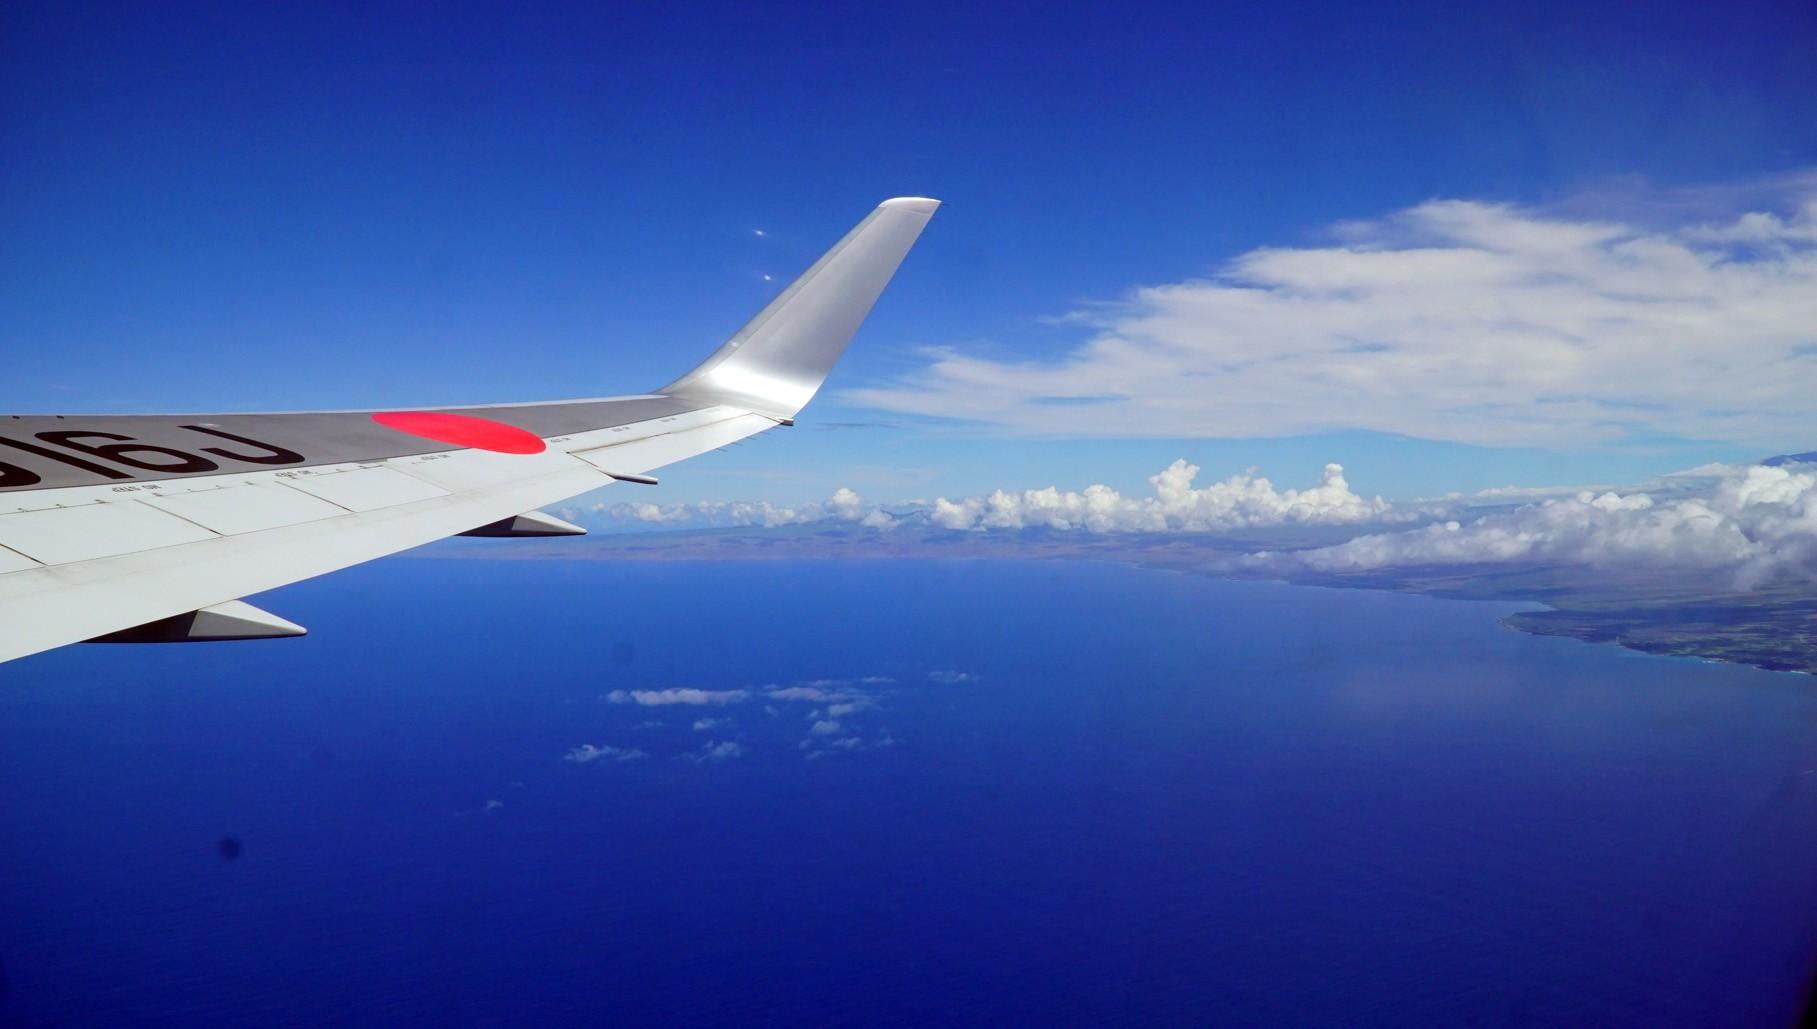 Re:[原创]夏威夷大岛深度游,全程体验新晋五星级航空日本航空